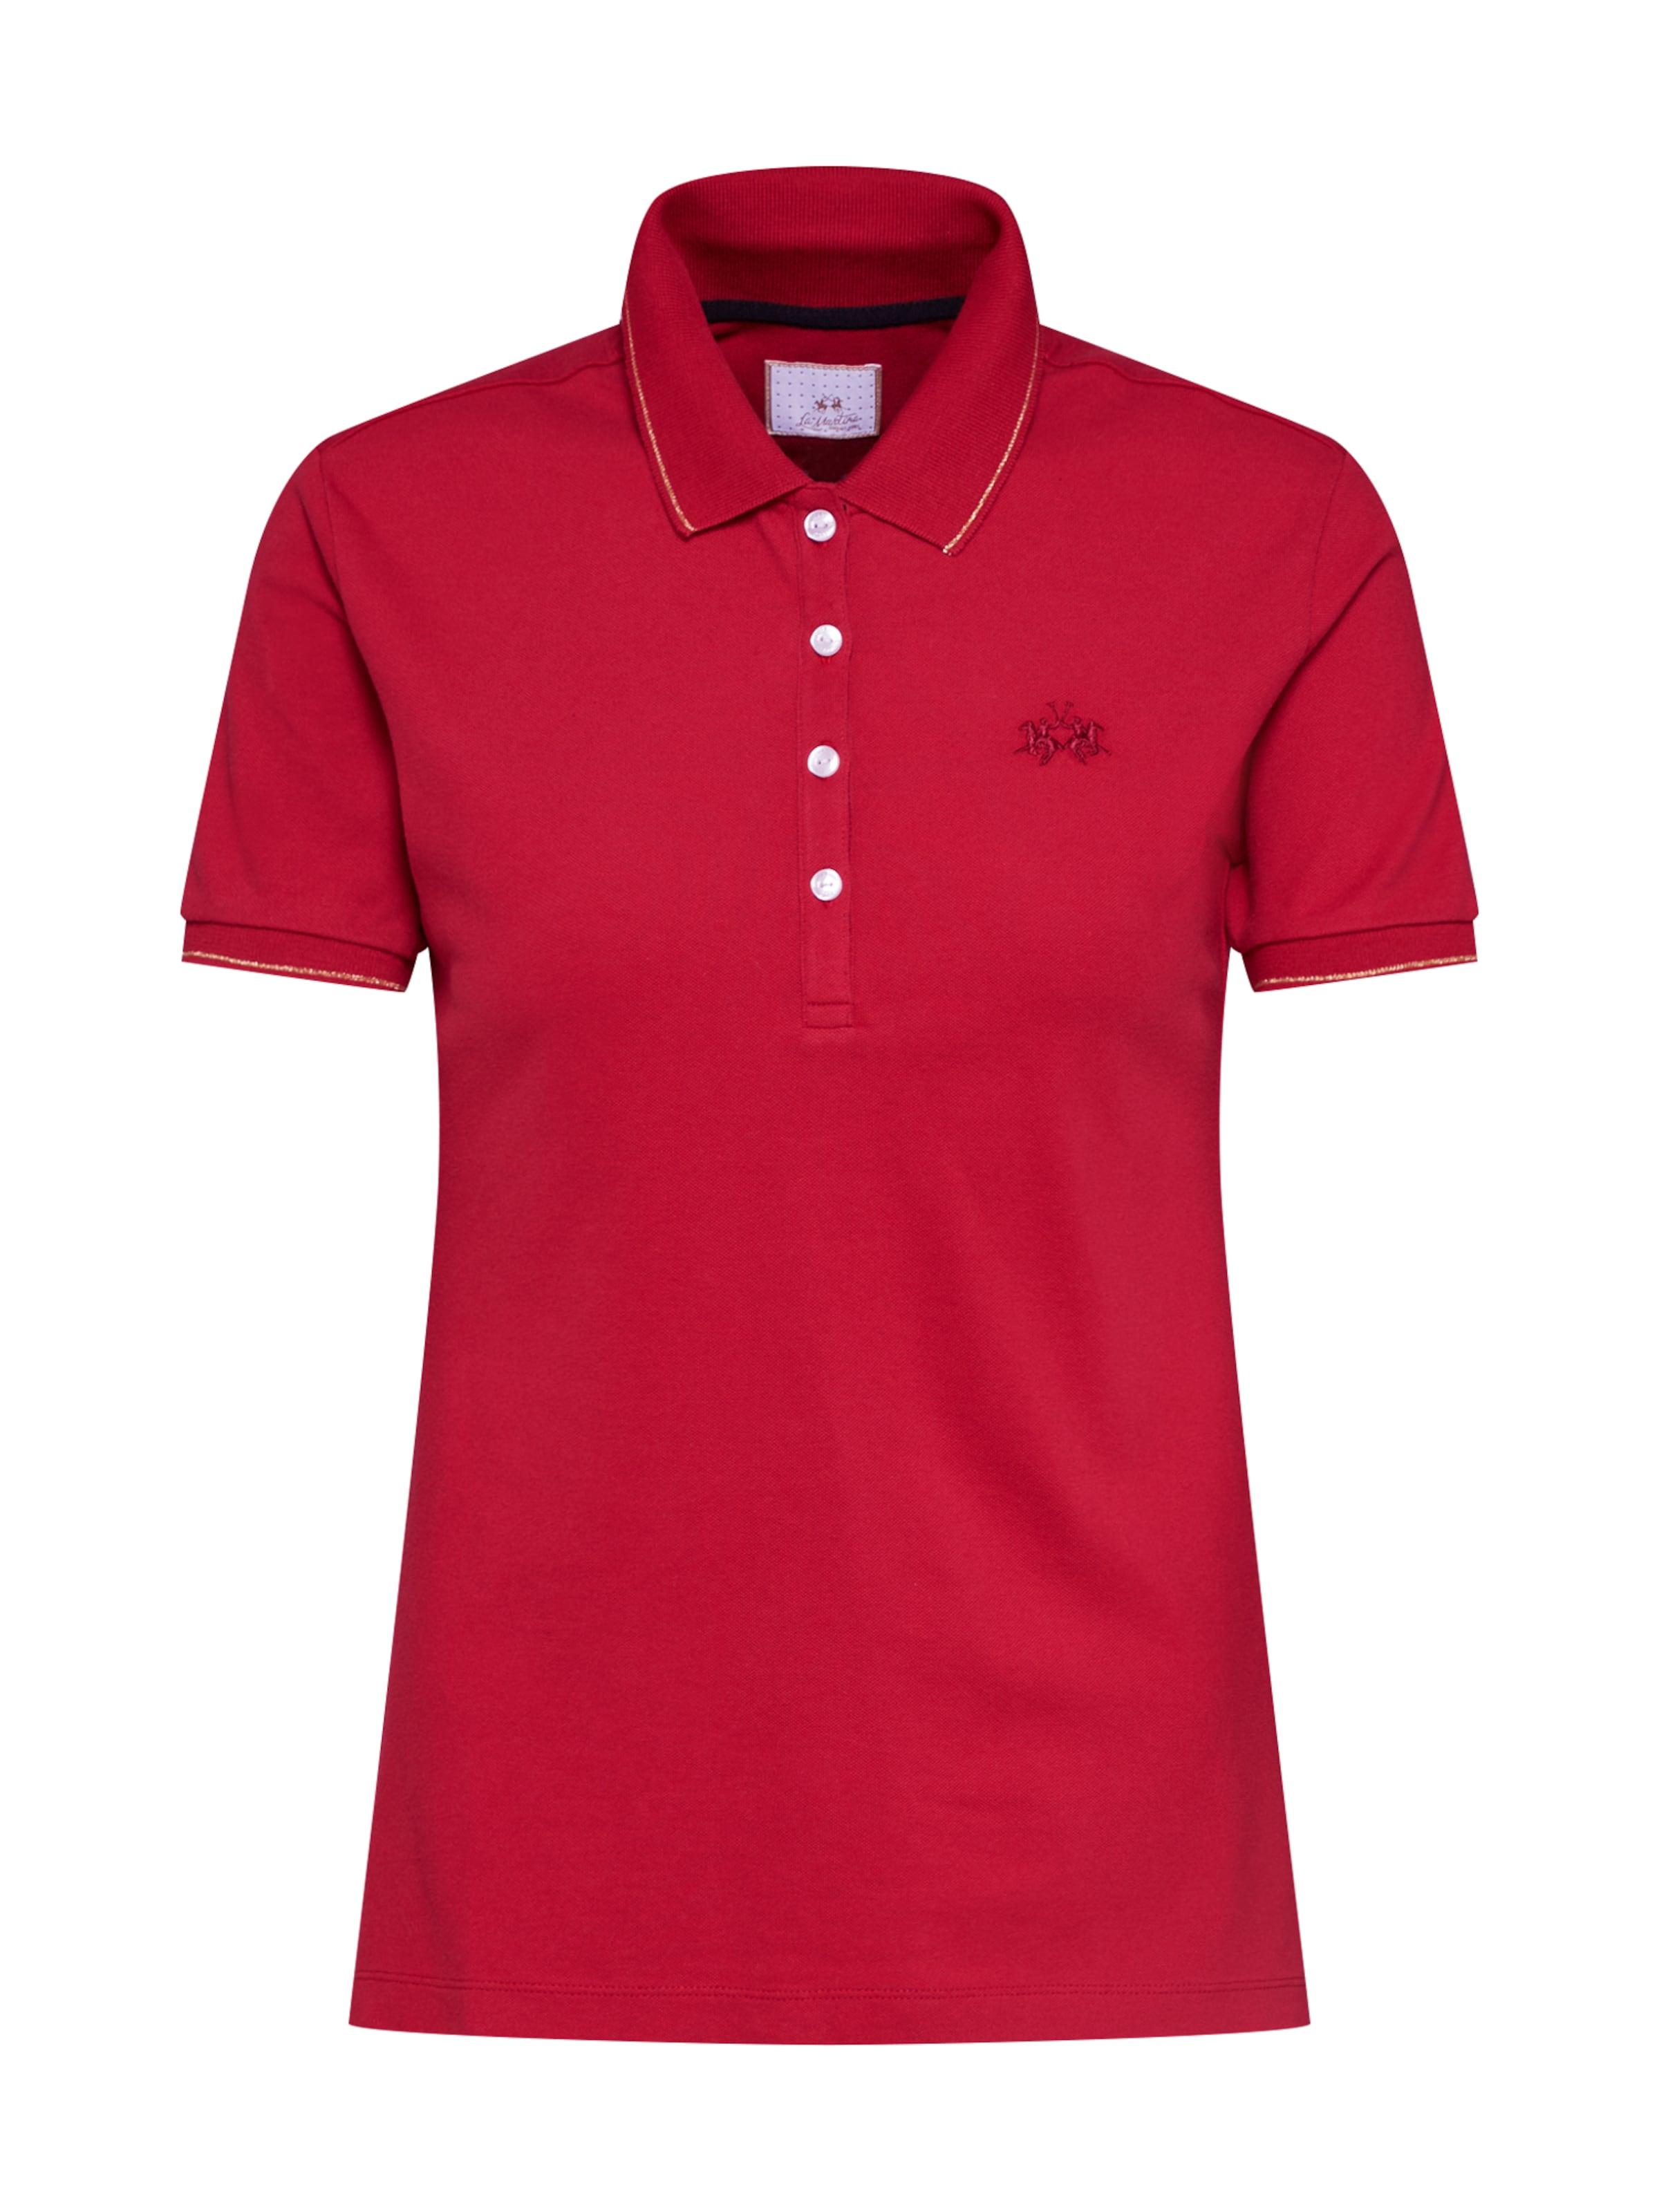 Damen La Martina Poloshirt 'WOMAN POLO S/S PIQUET STRETCH' rot | 07613314965250